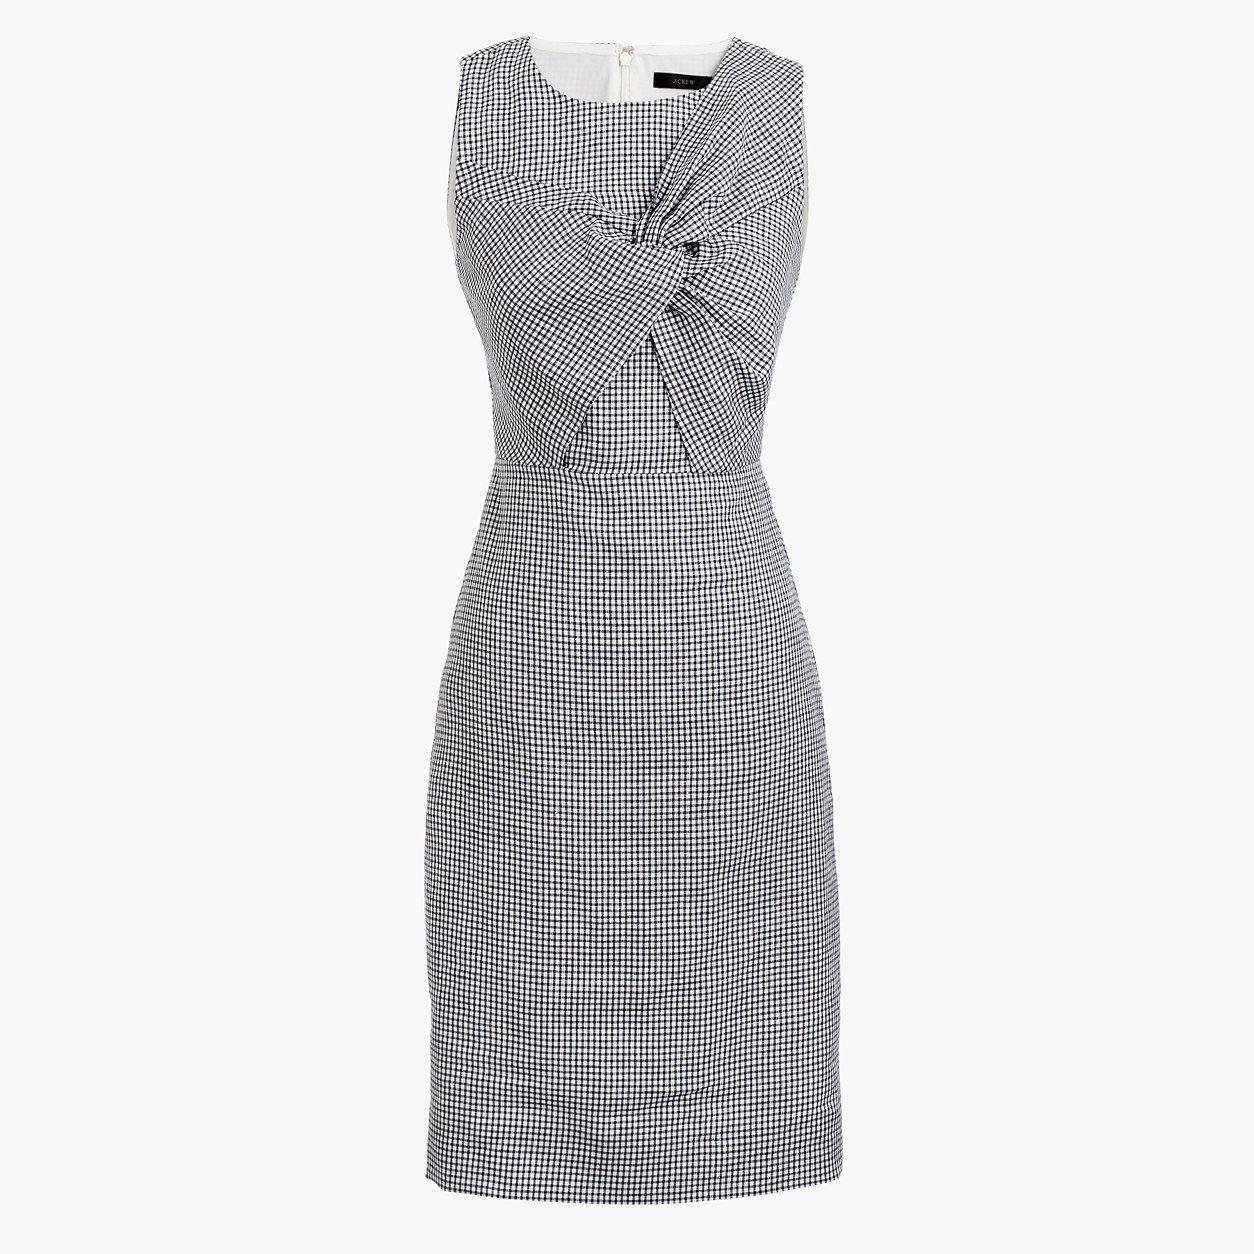 Petite drape knot windowpane dress in Irish linen | Products